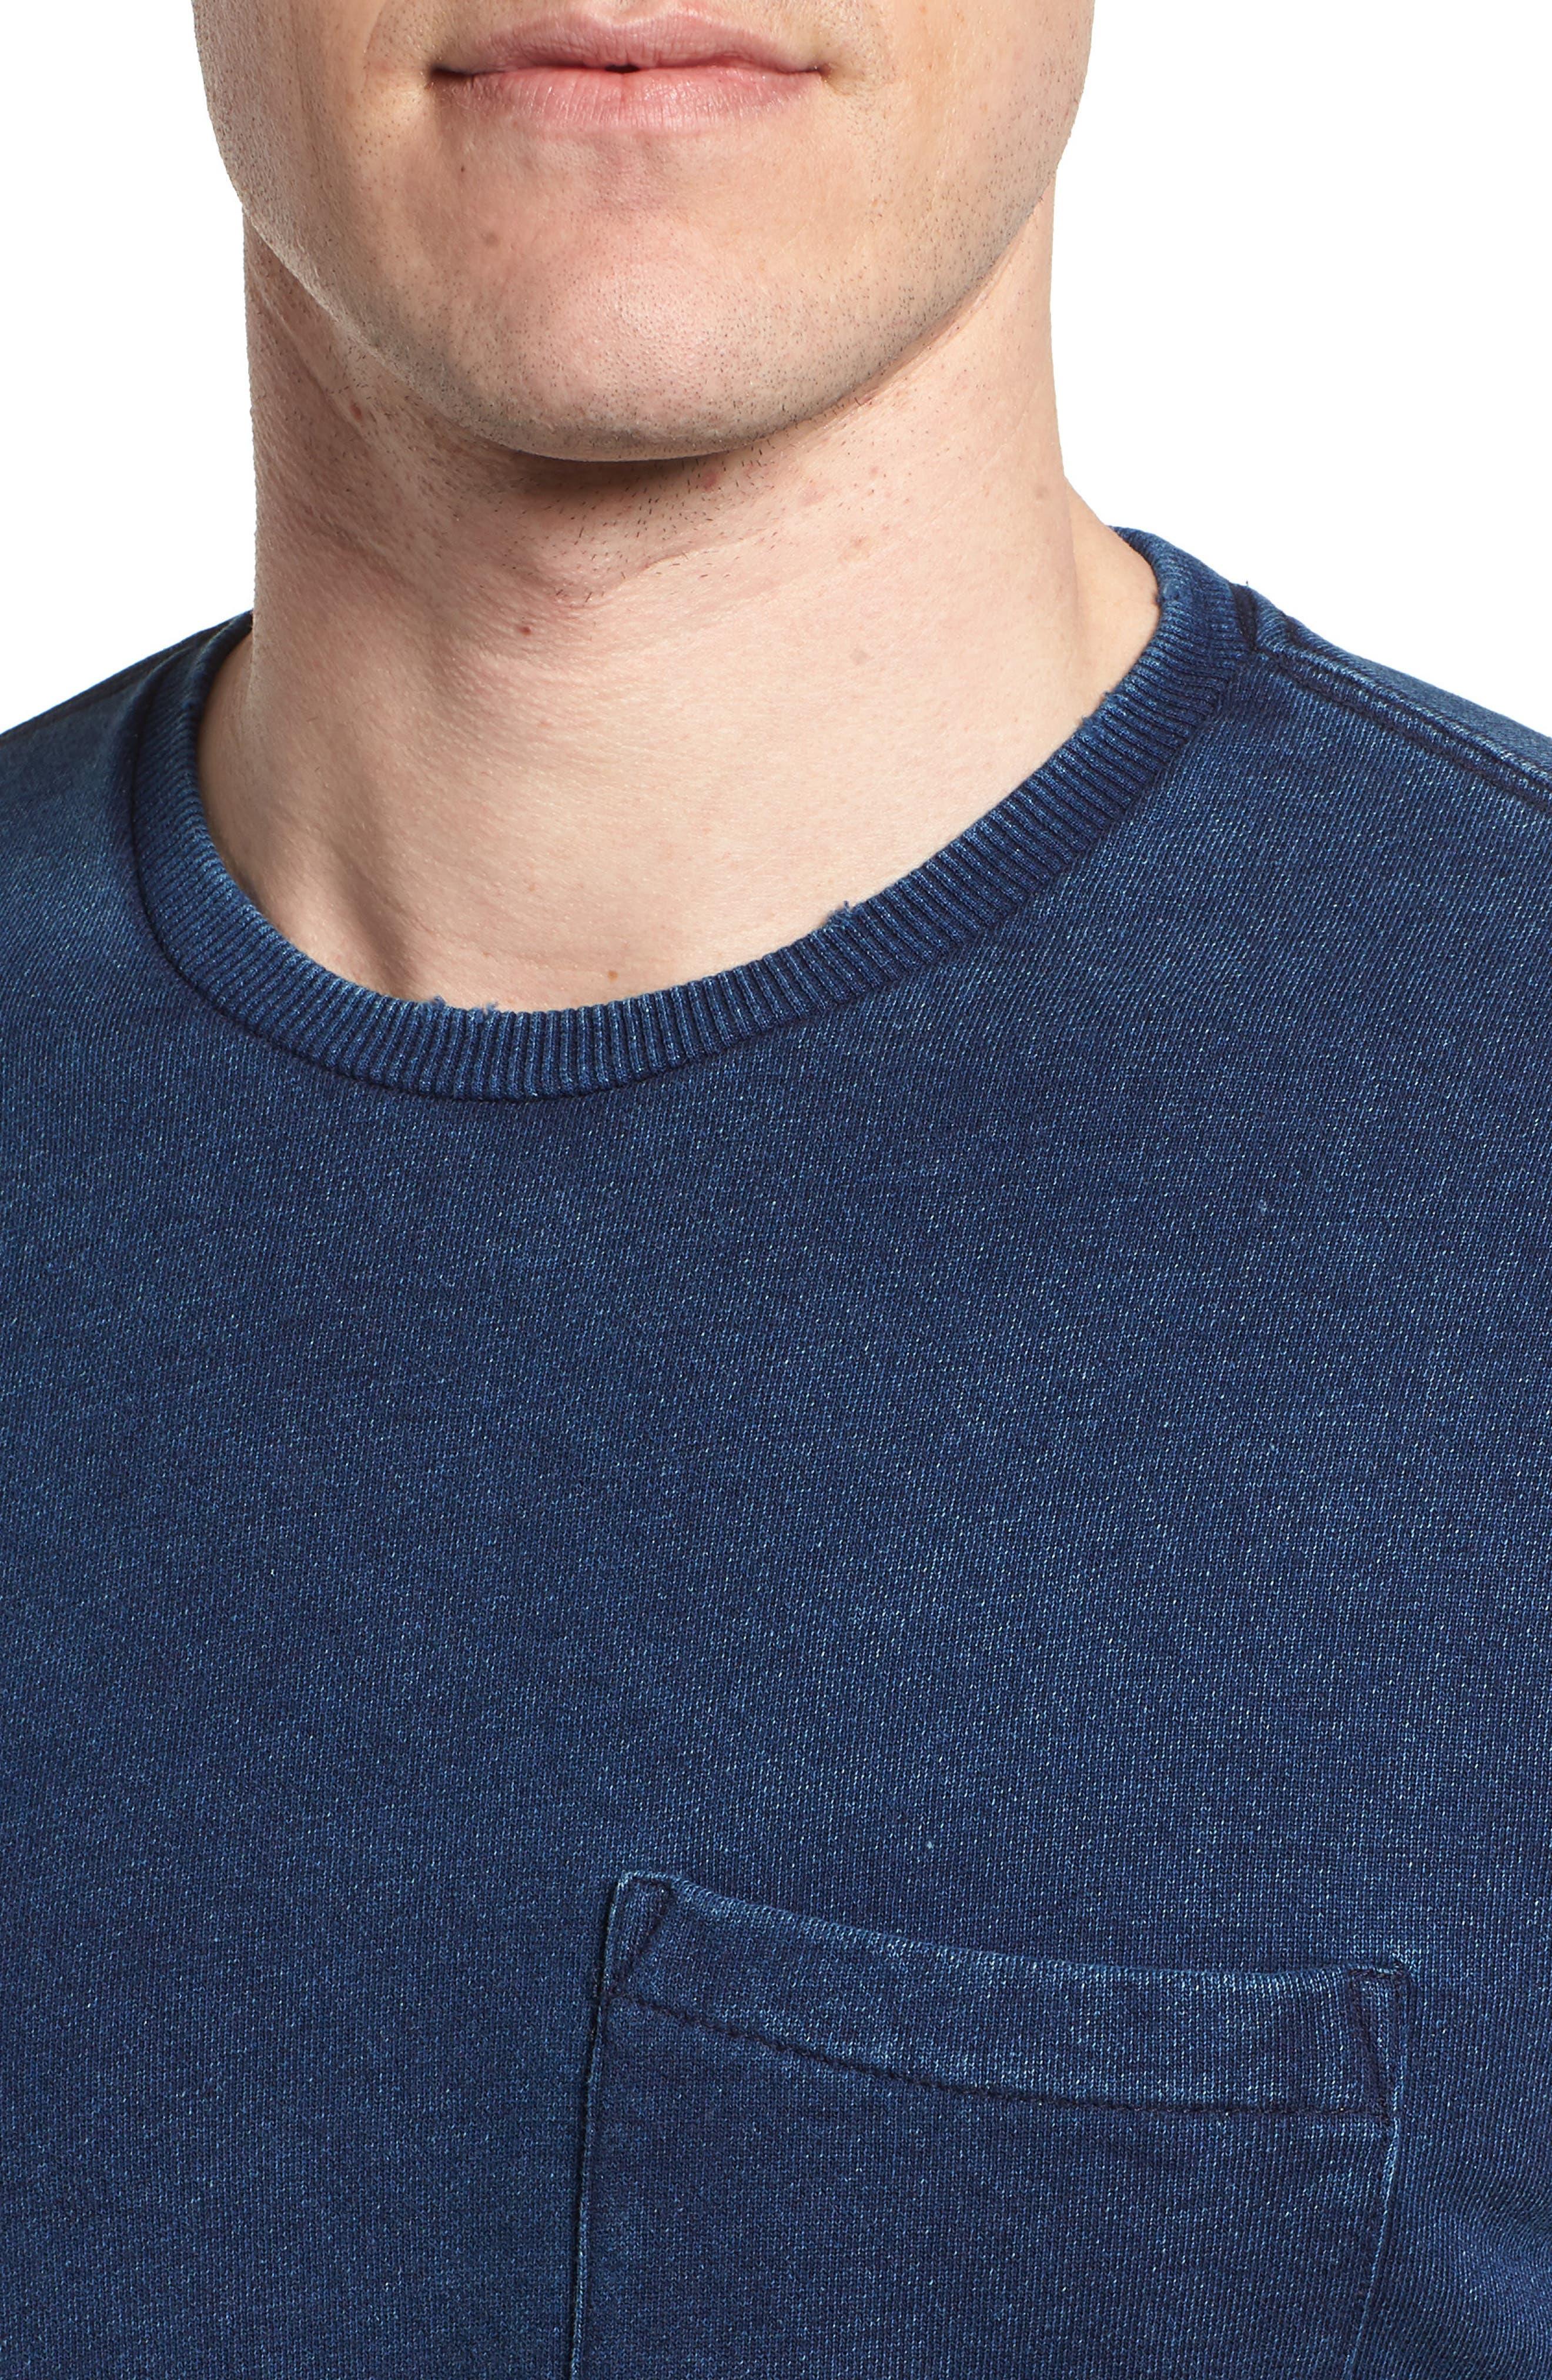 Byron Crewneck Cotton Pocket Sweatshirt,                             Alternate thumbnail 4, color,